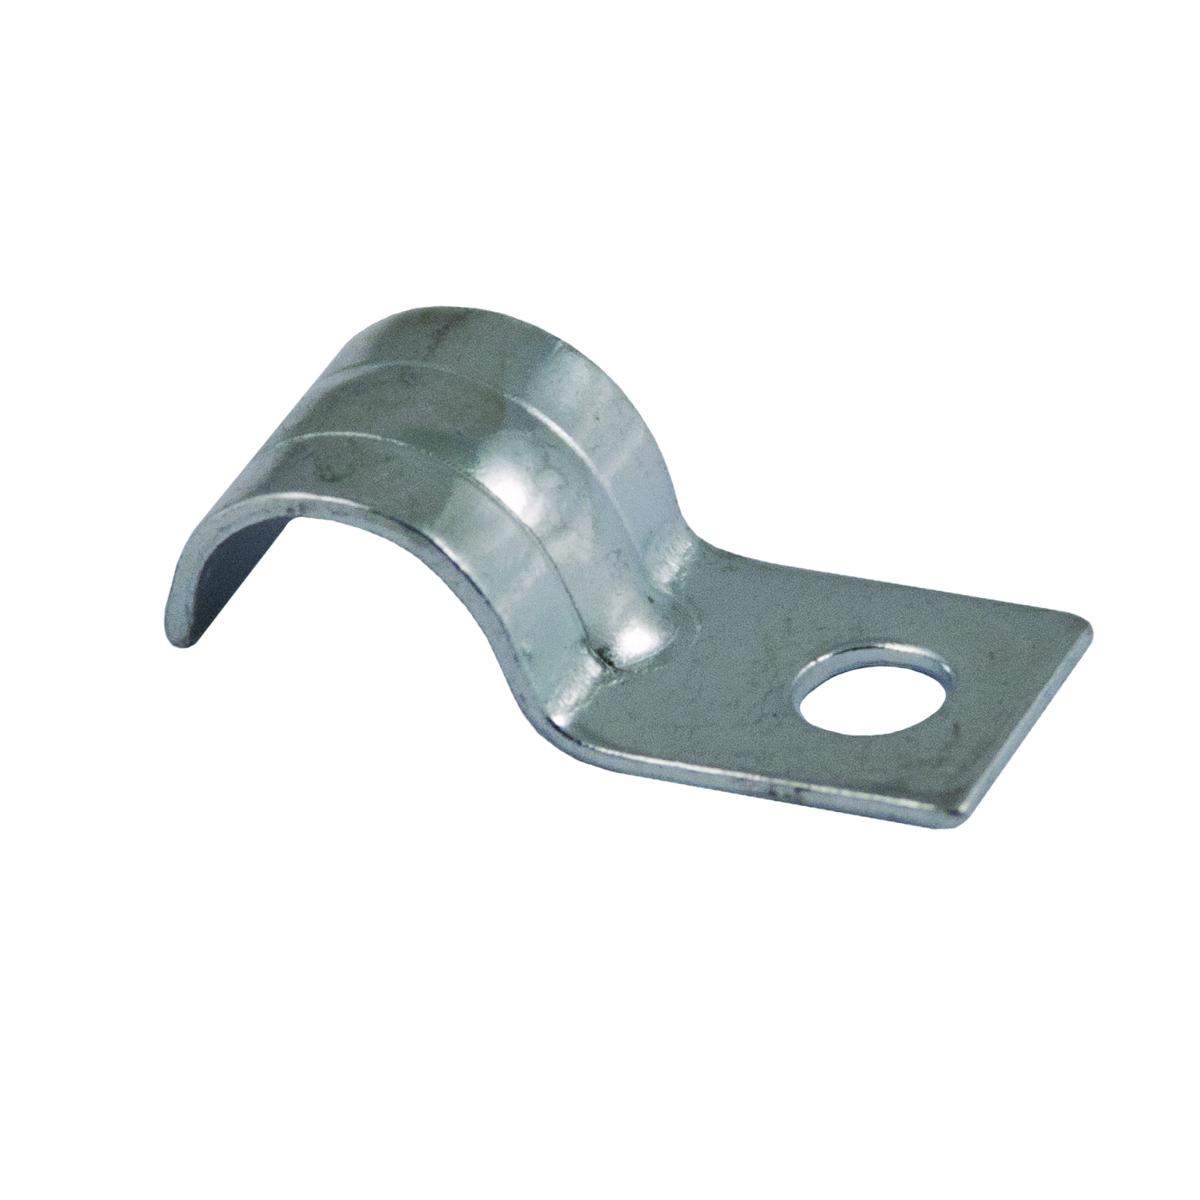 STRAP AC/MC 1-HOLE 3/8 IN STEEL